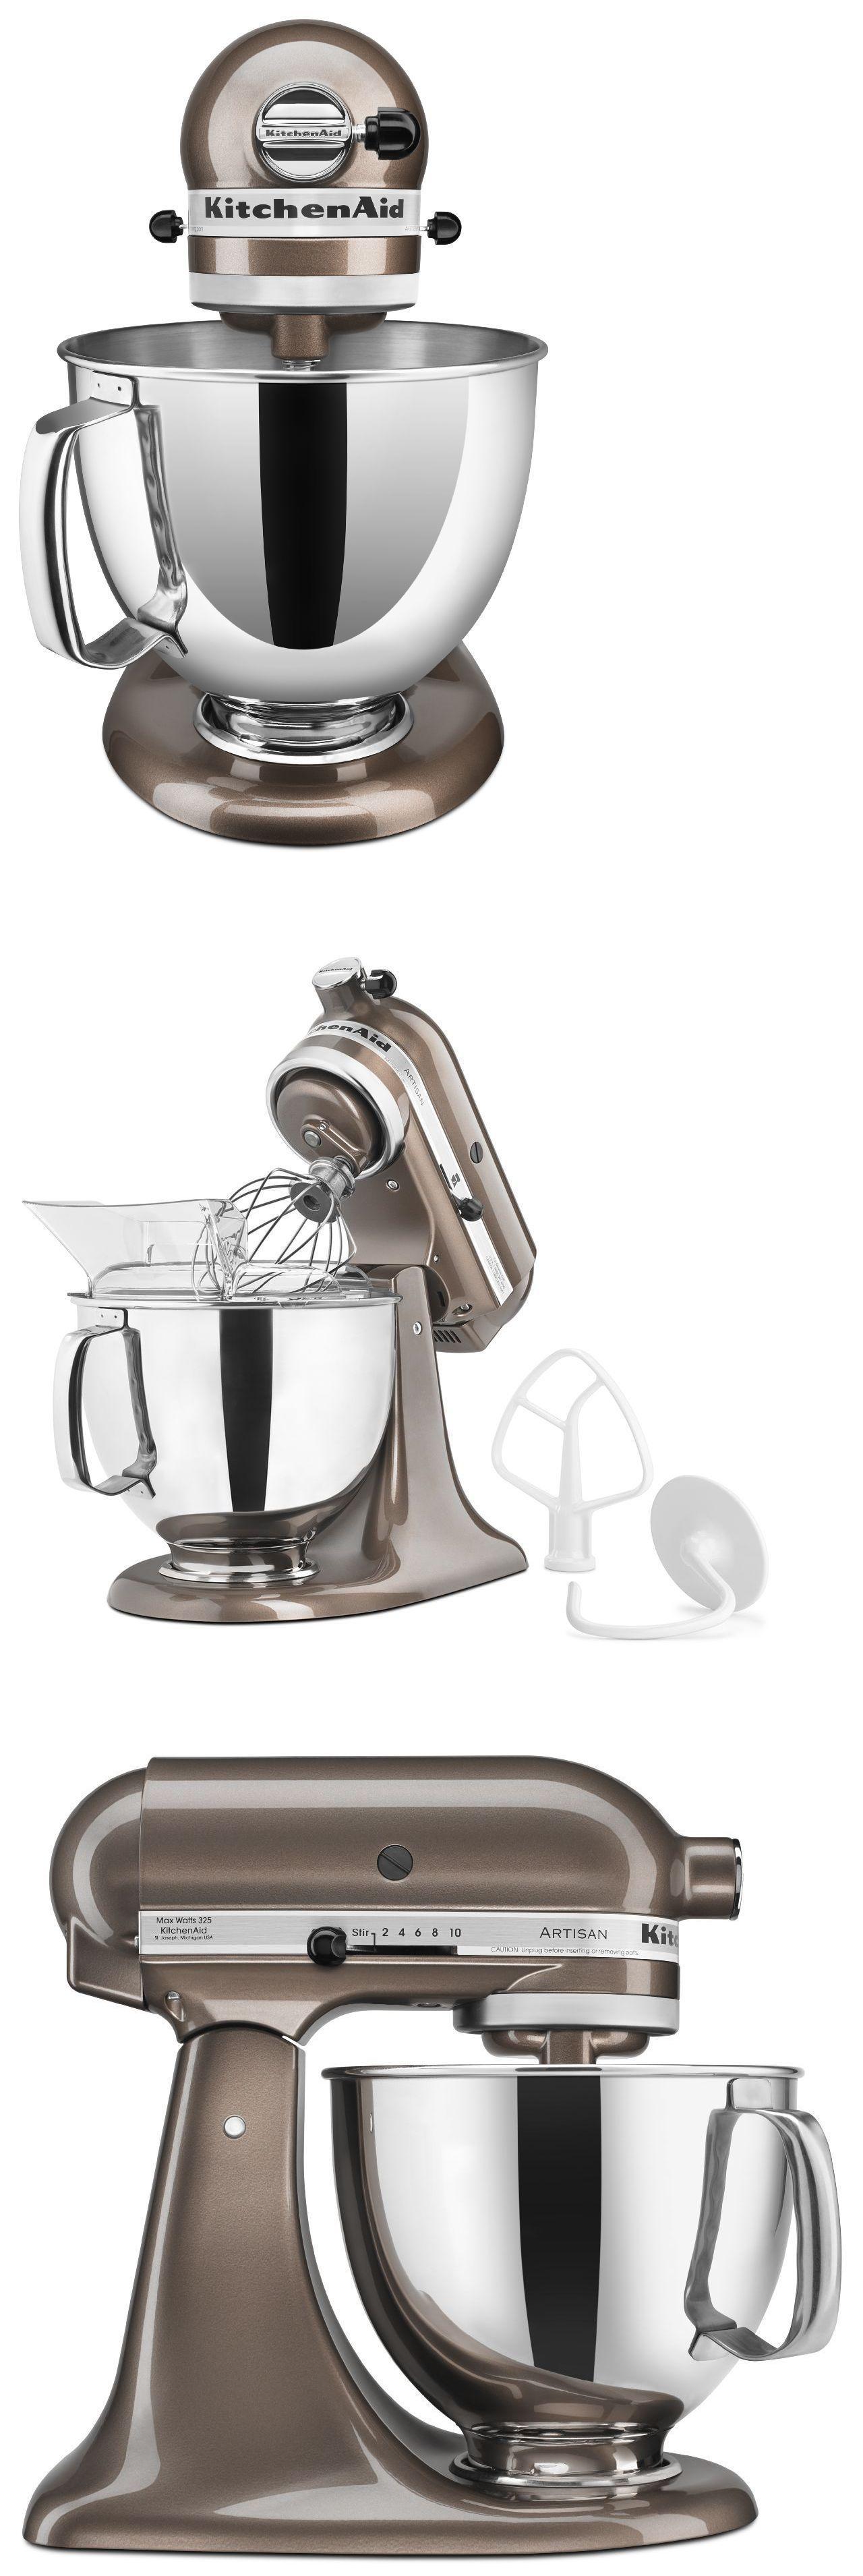 Countertop mixers 133701 kitchenaid artisan series 5